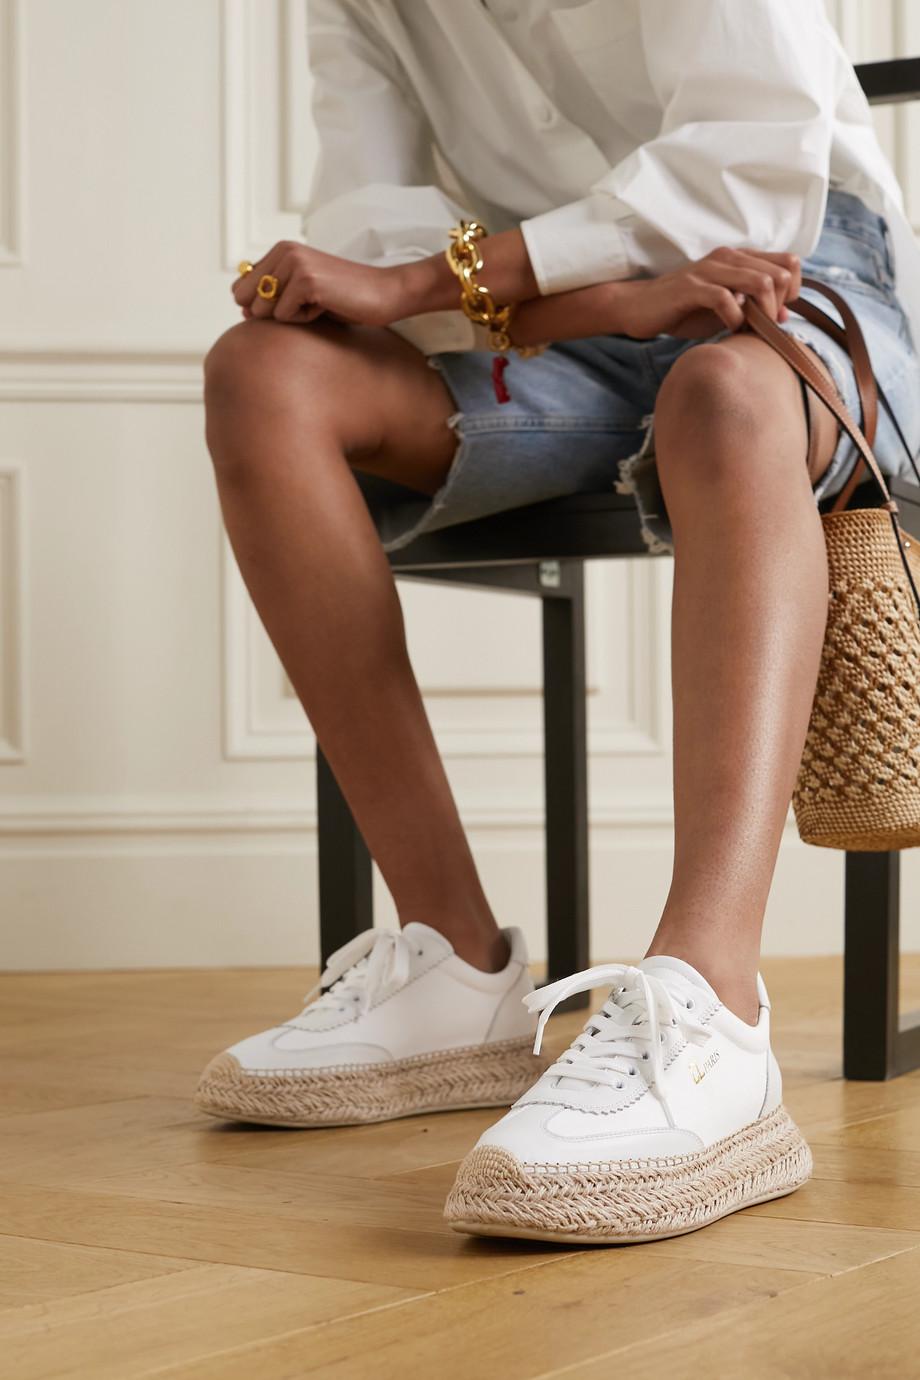 Christian Louboutin Espasneak leather espadrille platform sneakers